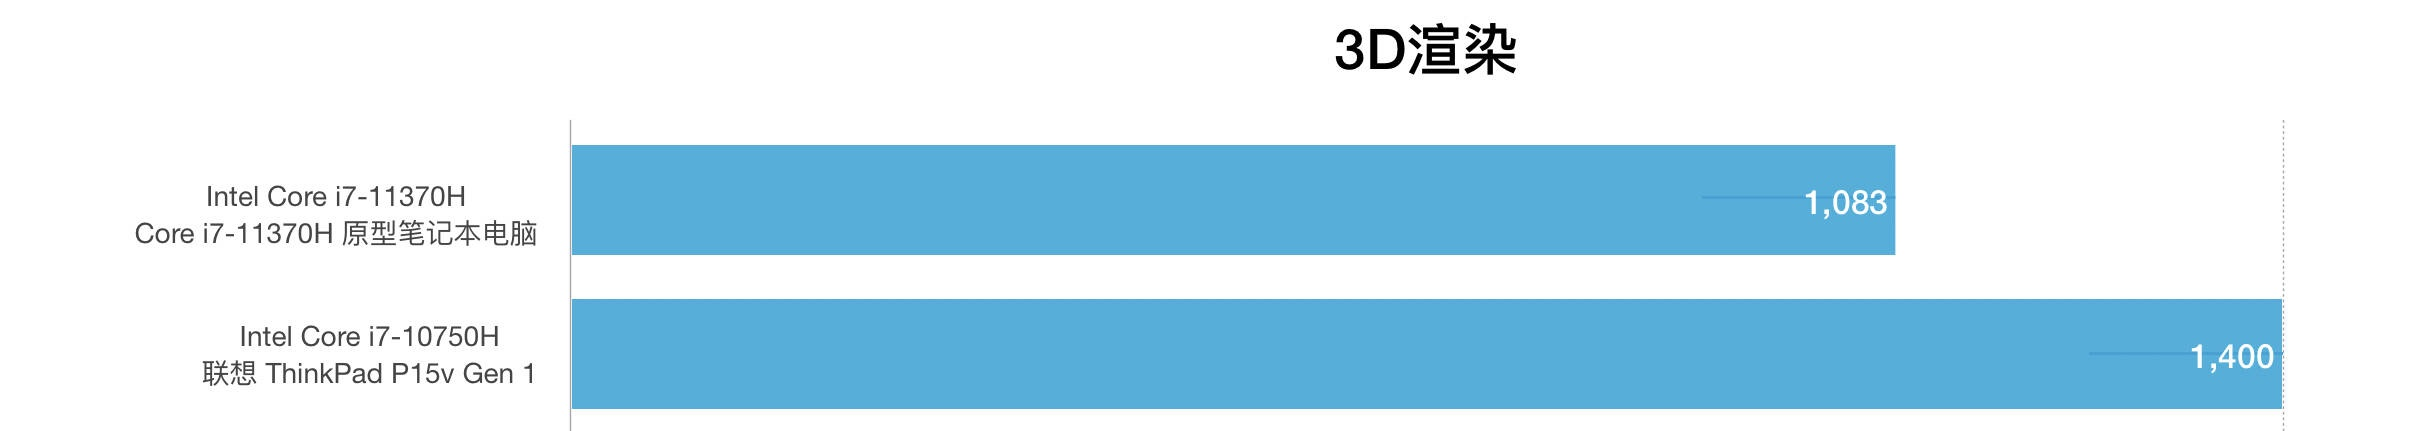 Intel Core i7-11370H和i7-10750H性能跑分对比评测